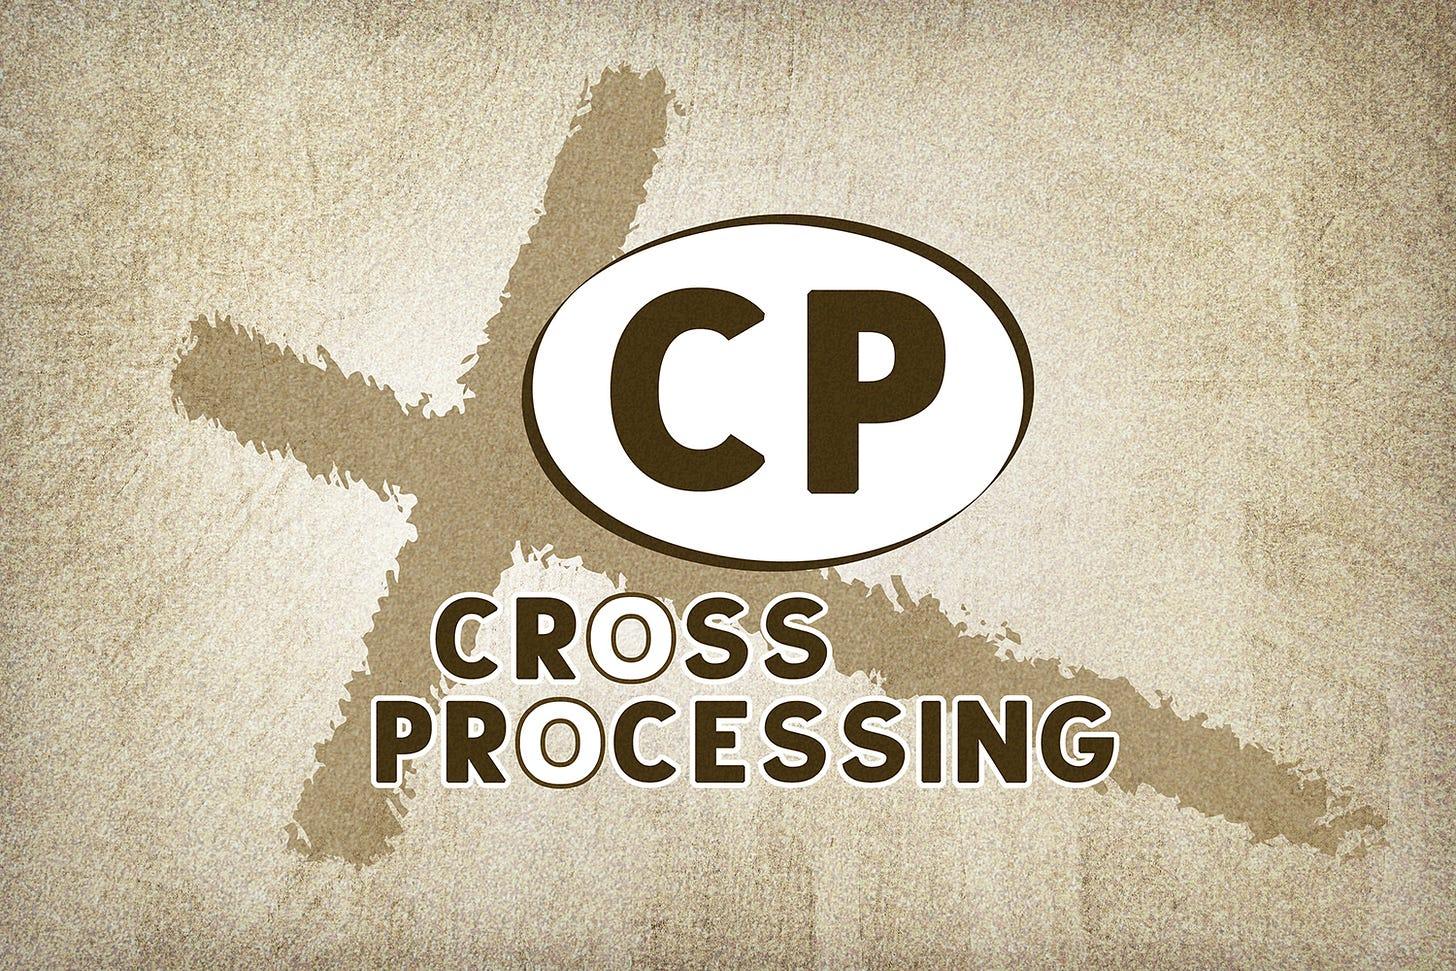 Cross Processing logo